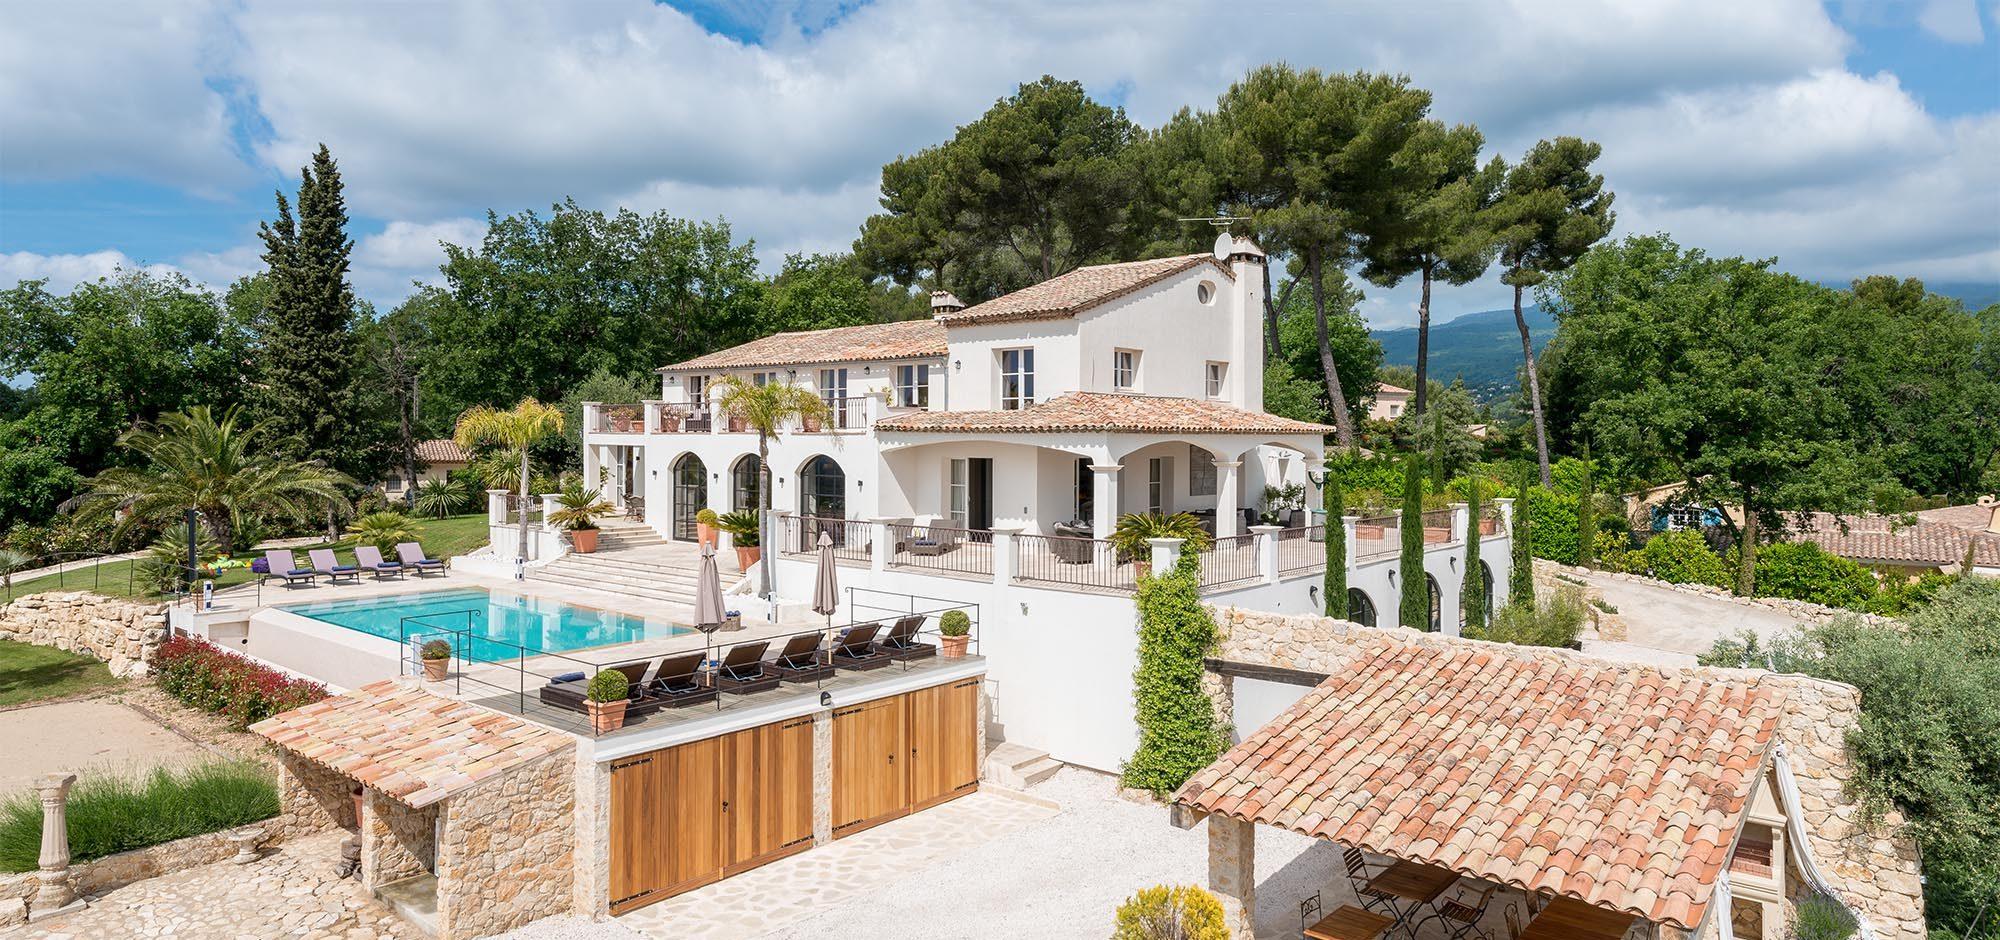 Villa Menuse exterior